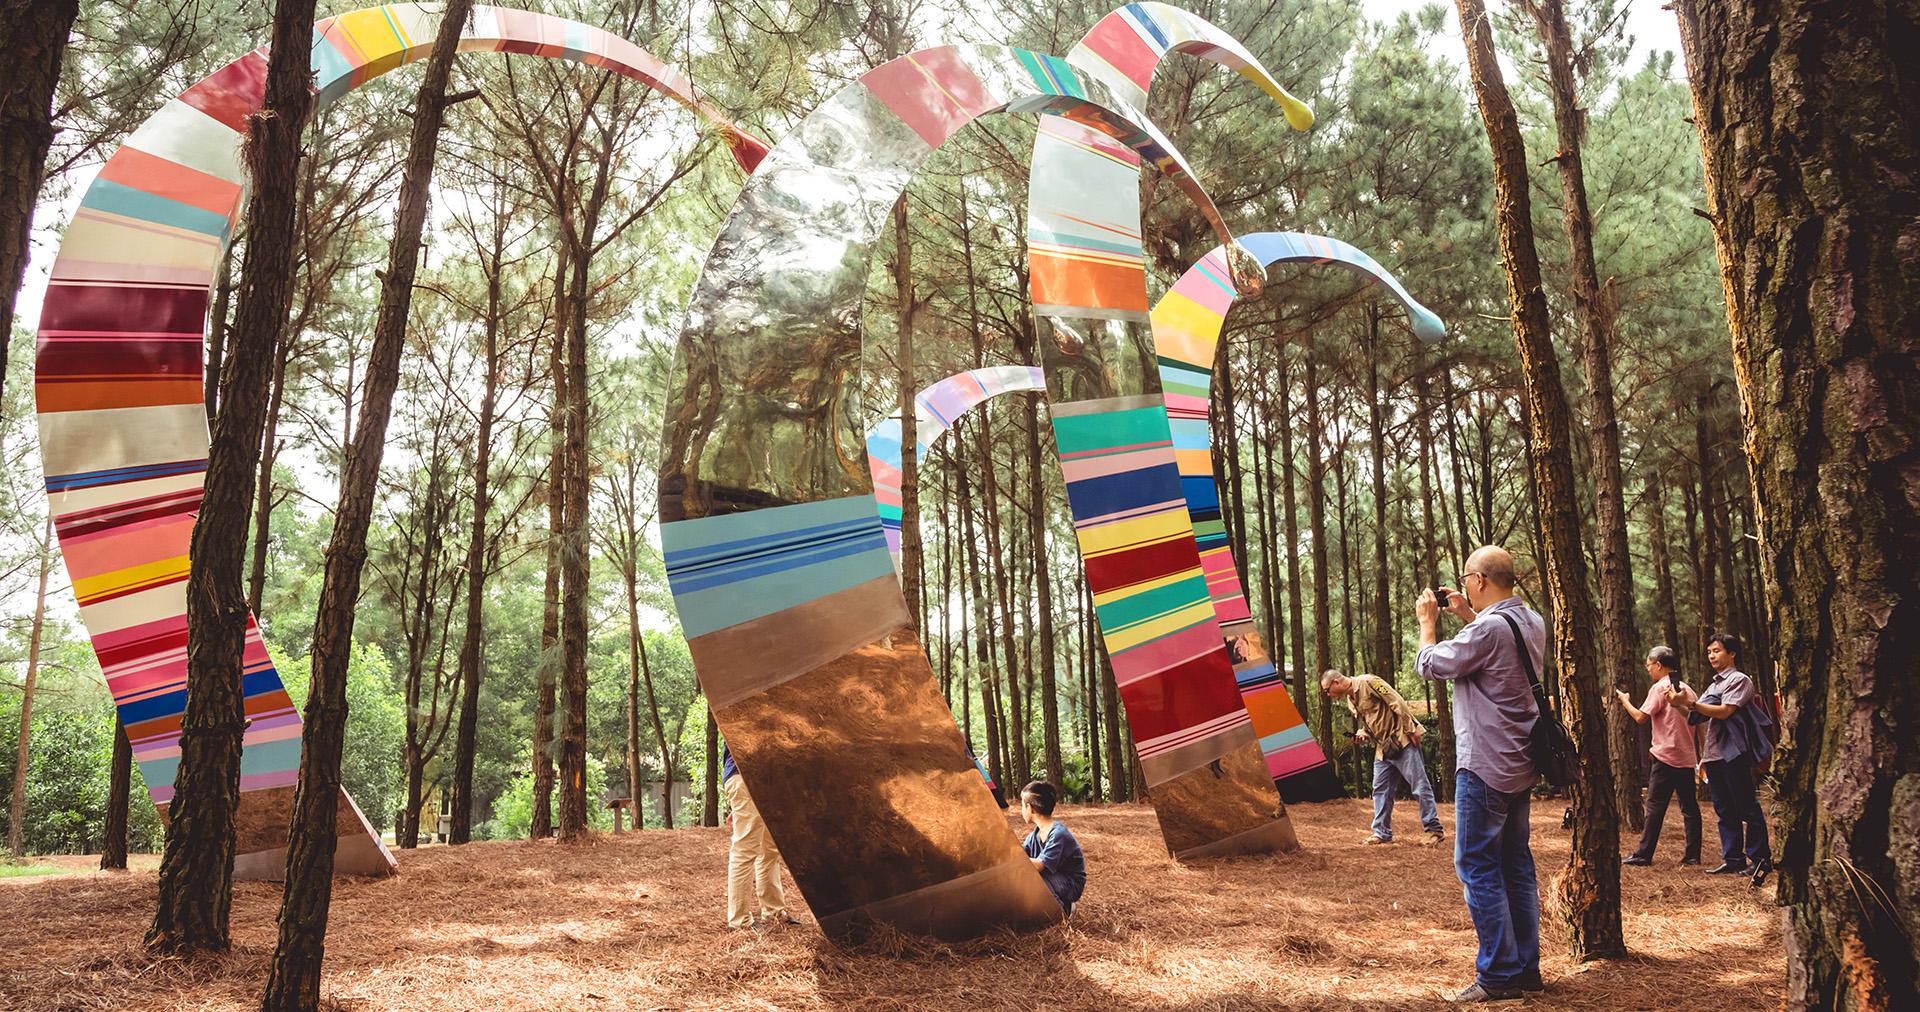 ART IN THE FOREST SUMMER – 2019: dưới ánh mặt trời